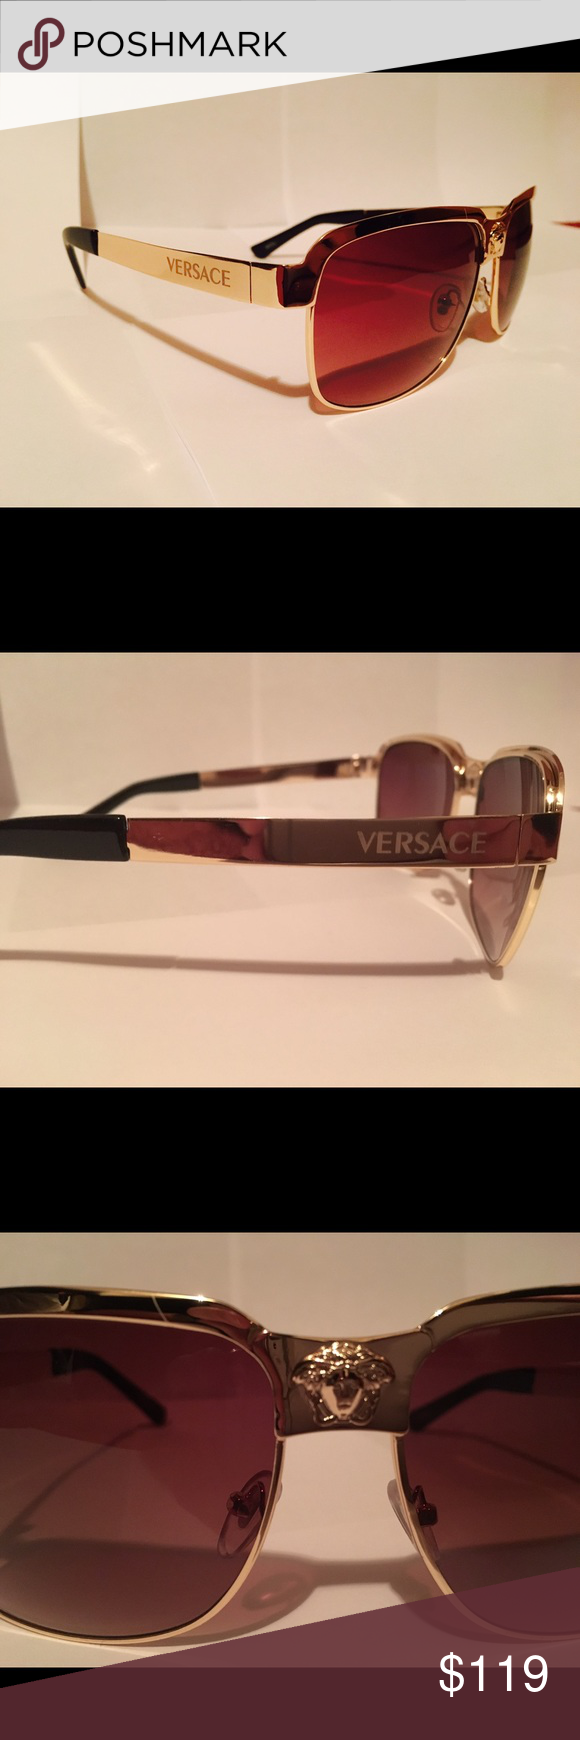 f61254236cd Men s Versace Sunglasses 🔥 Brand new! Gold accent frames